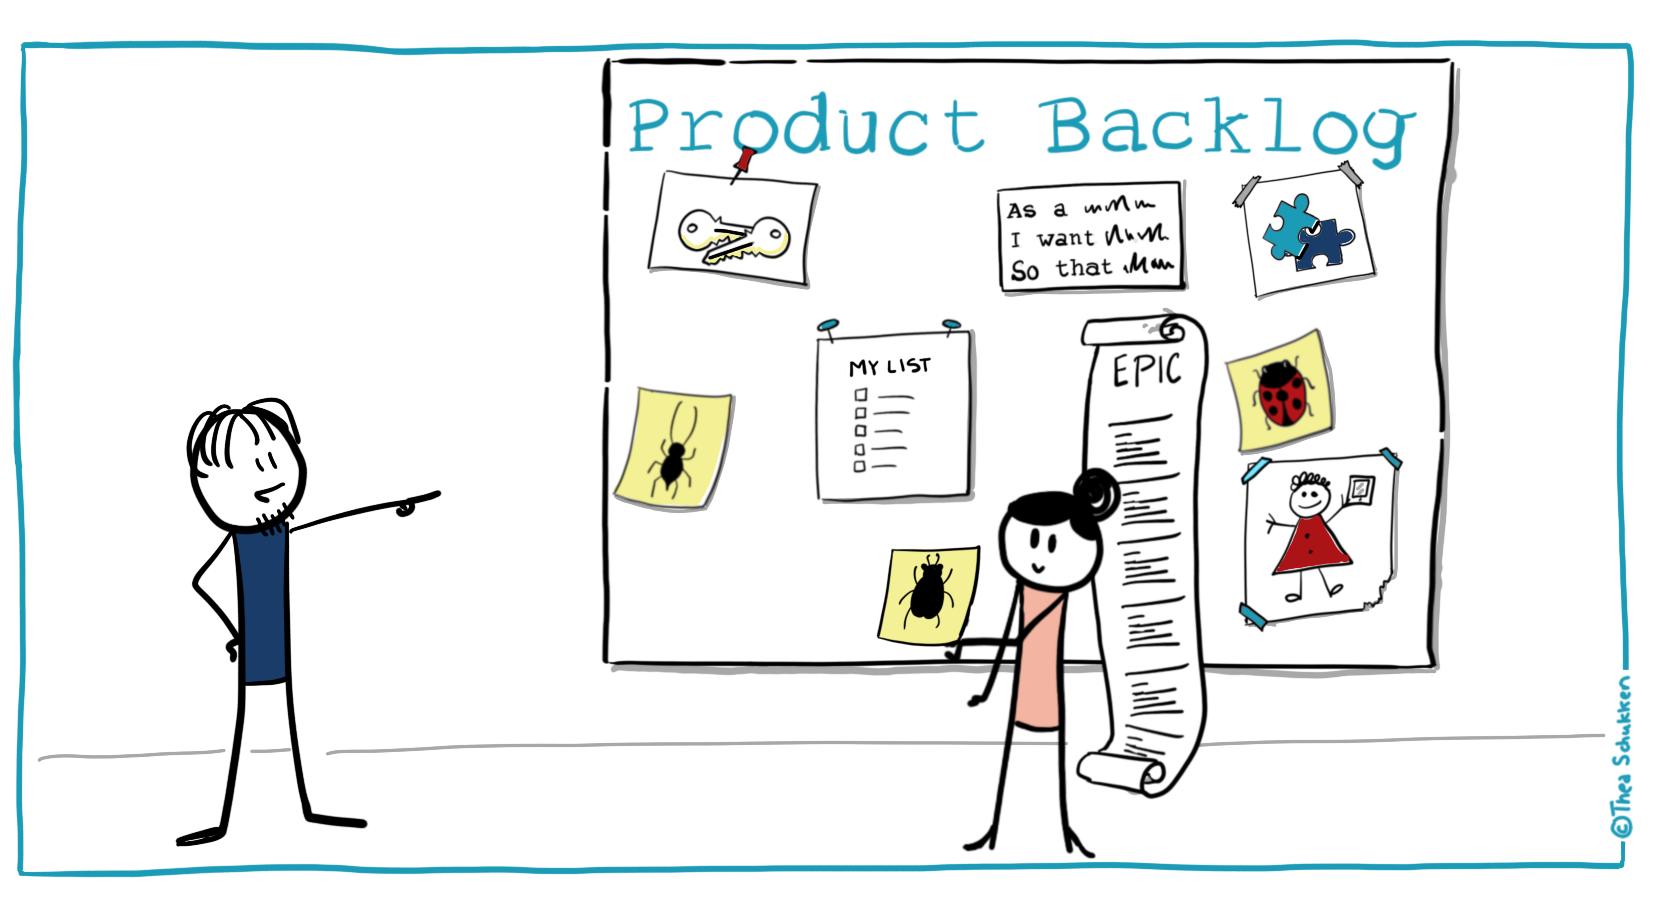 Product Backlog Scrum